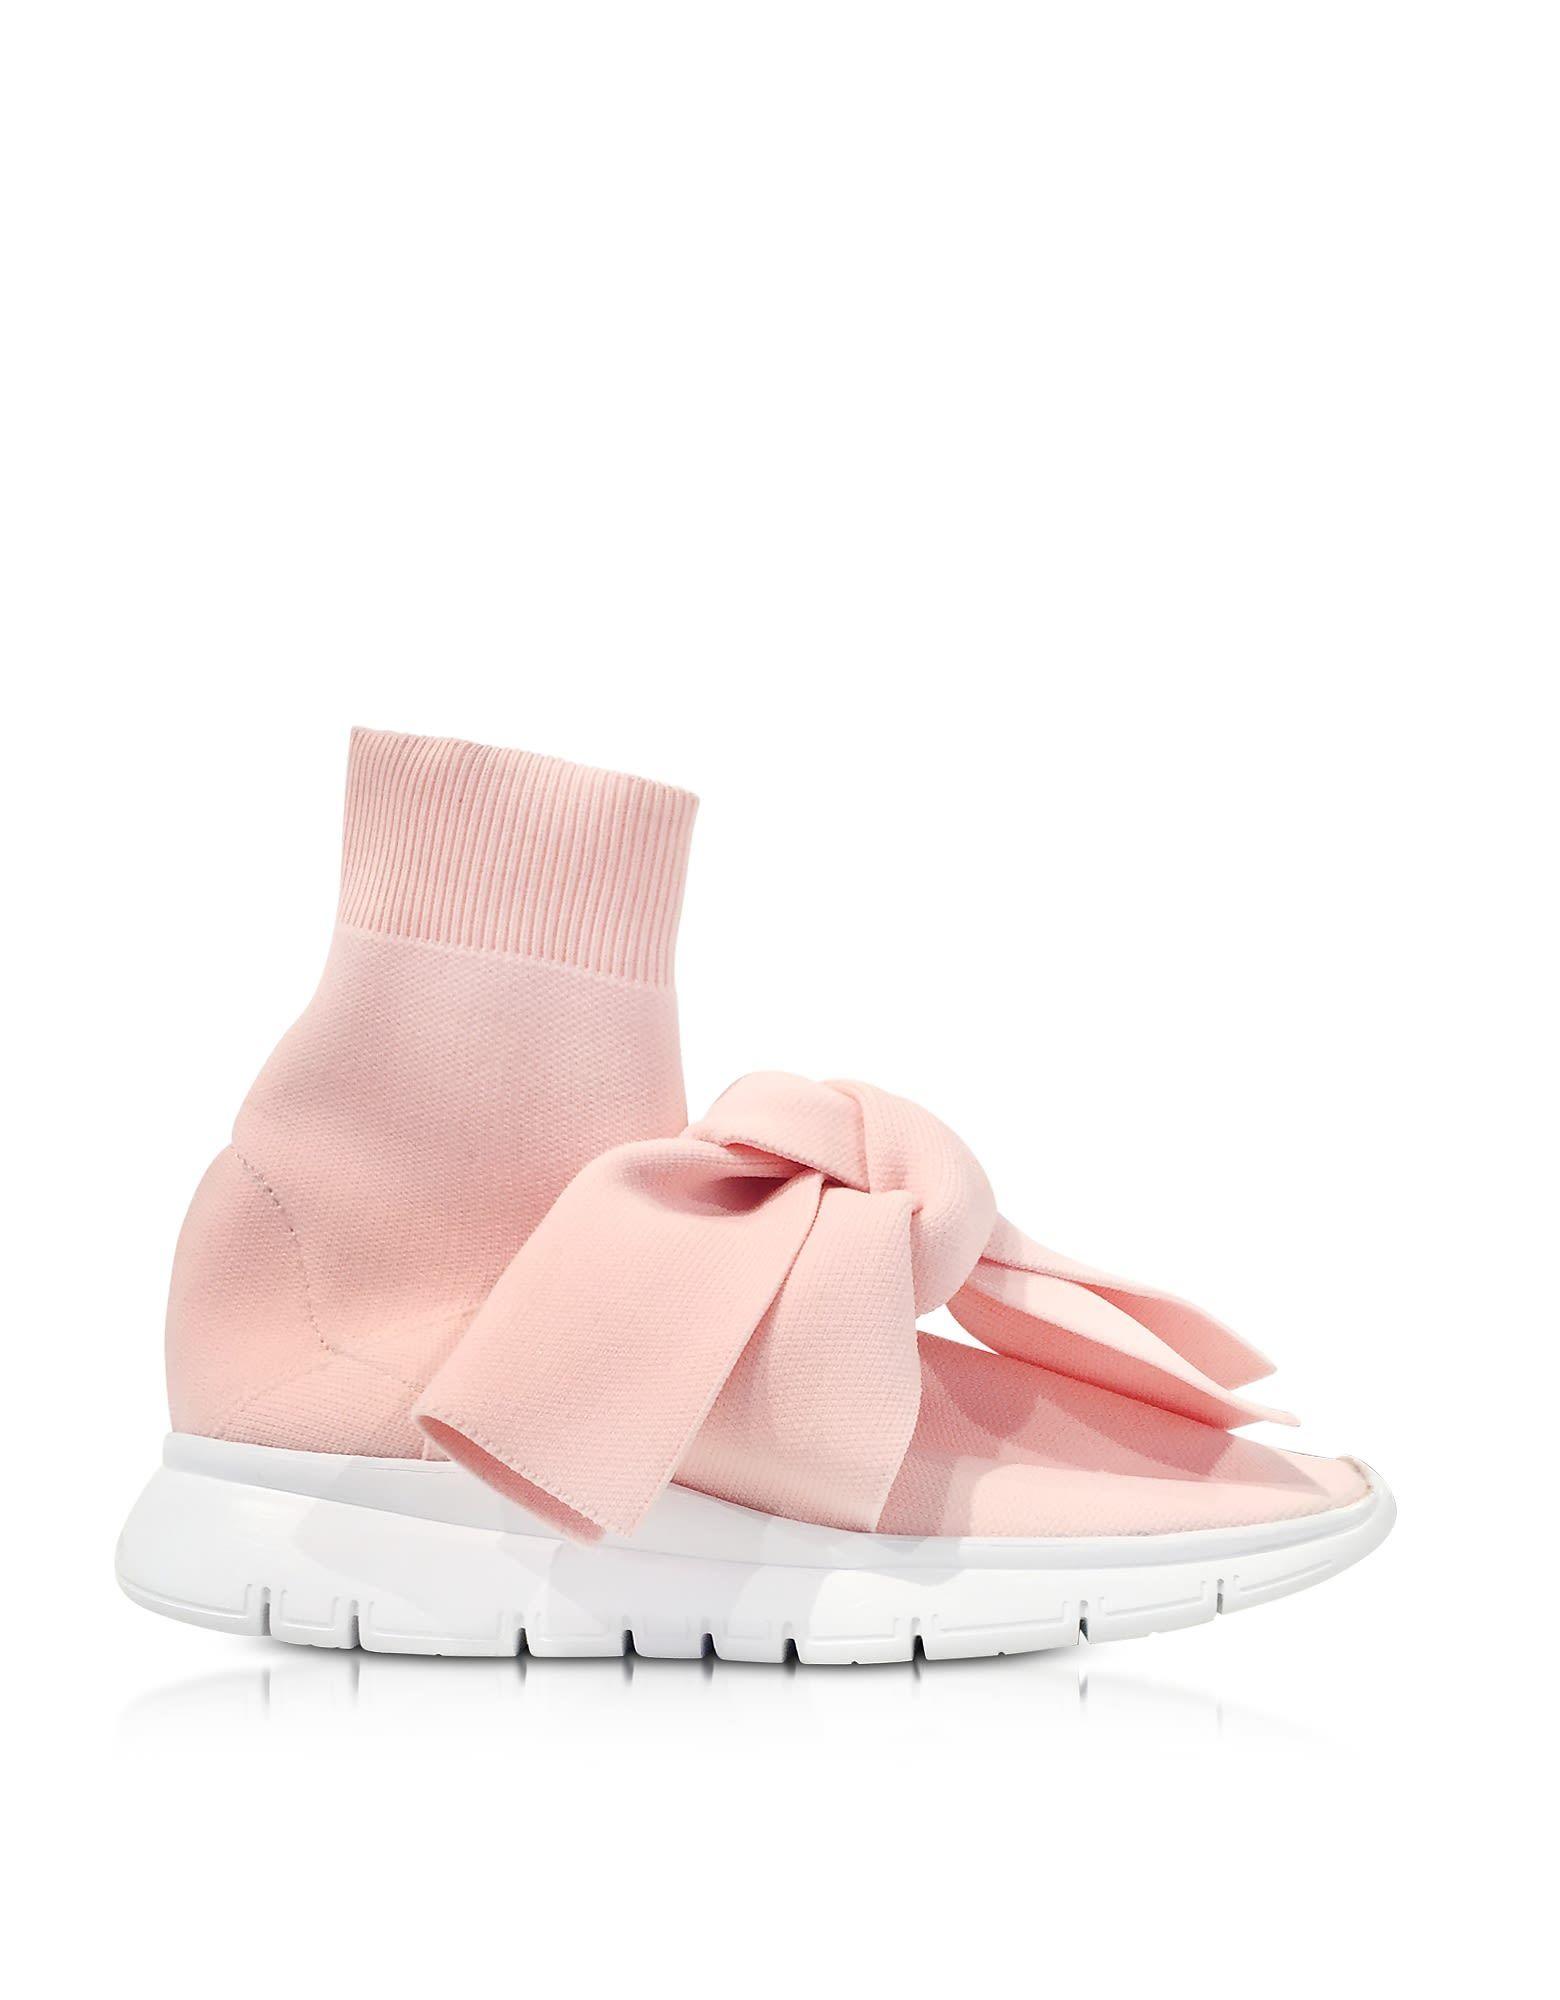 Nylon Joshua Joshua Pink Sock SandersKnot Pink Joshua SandersKnot Nylon SandersKnot Pink Sock 80nONwvm